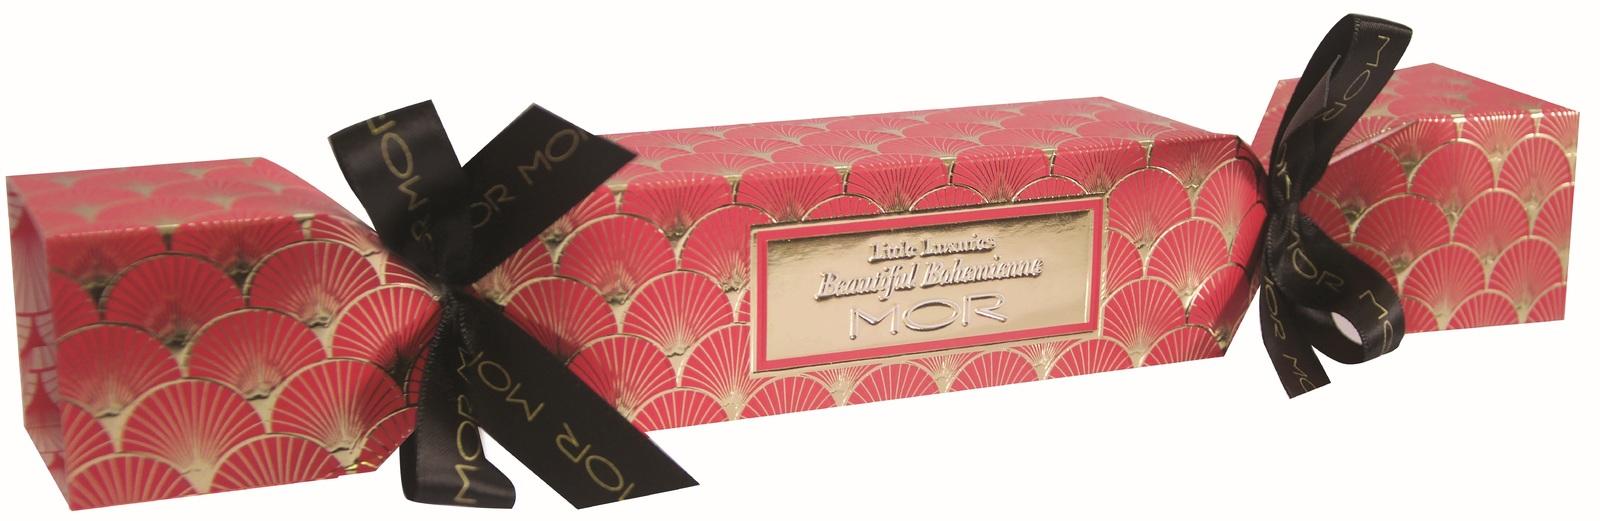 MOR Beautiful Bohemienne Bonbon (50ml Hand Cream) image